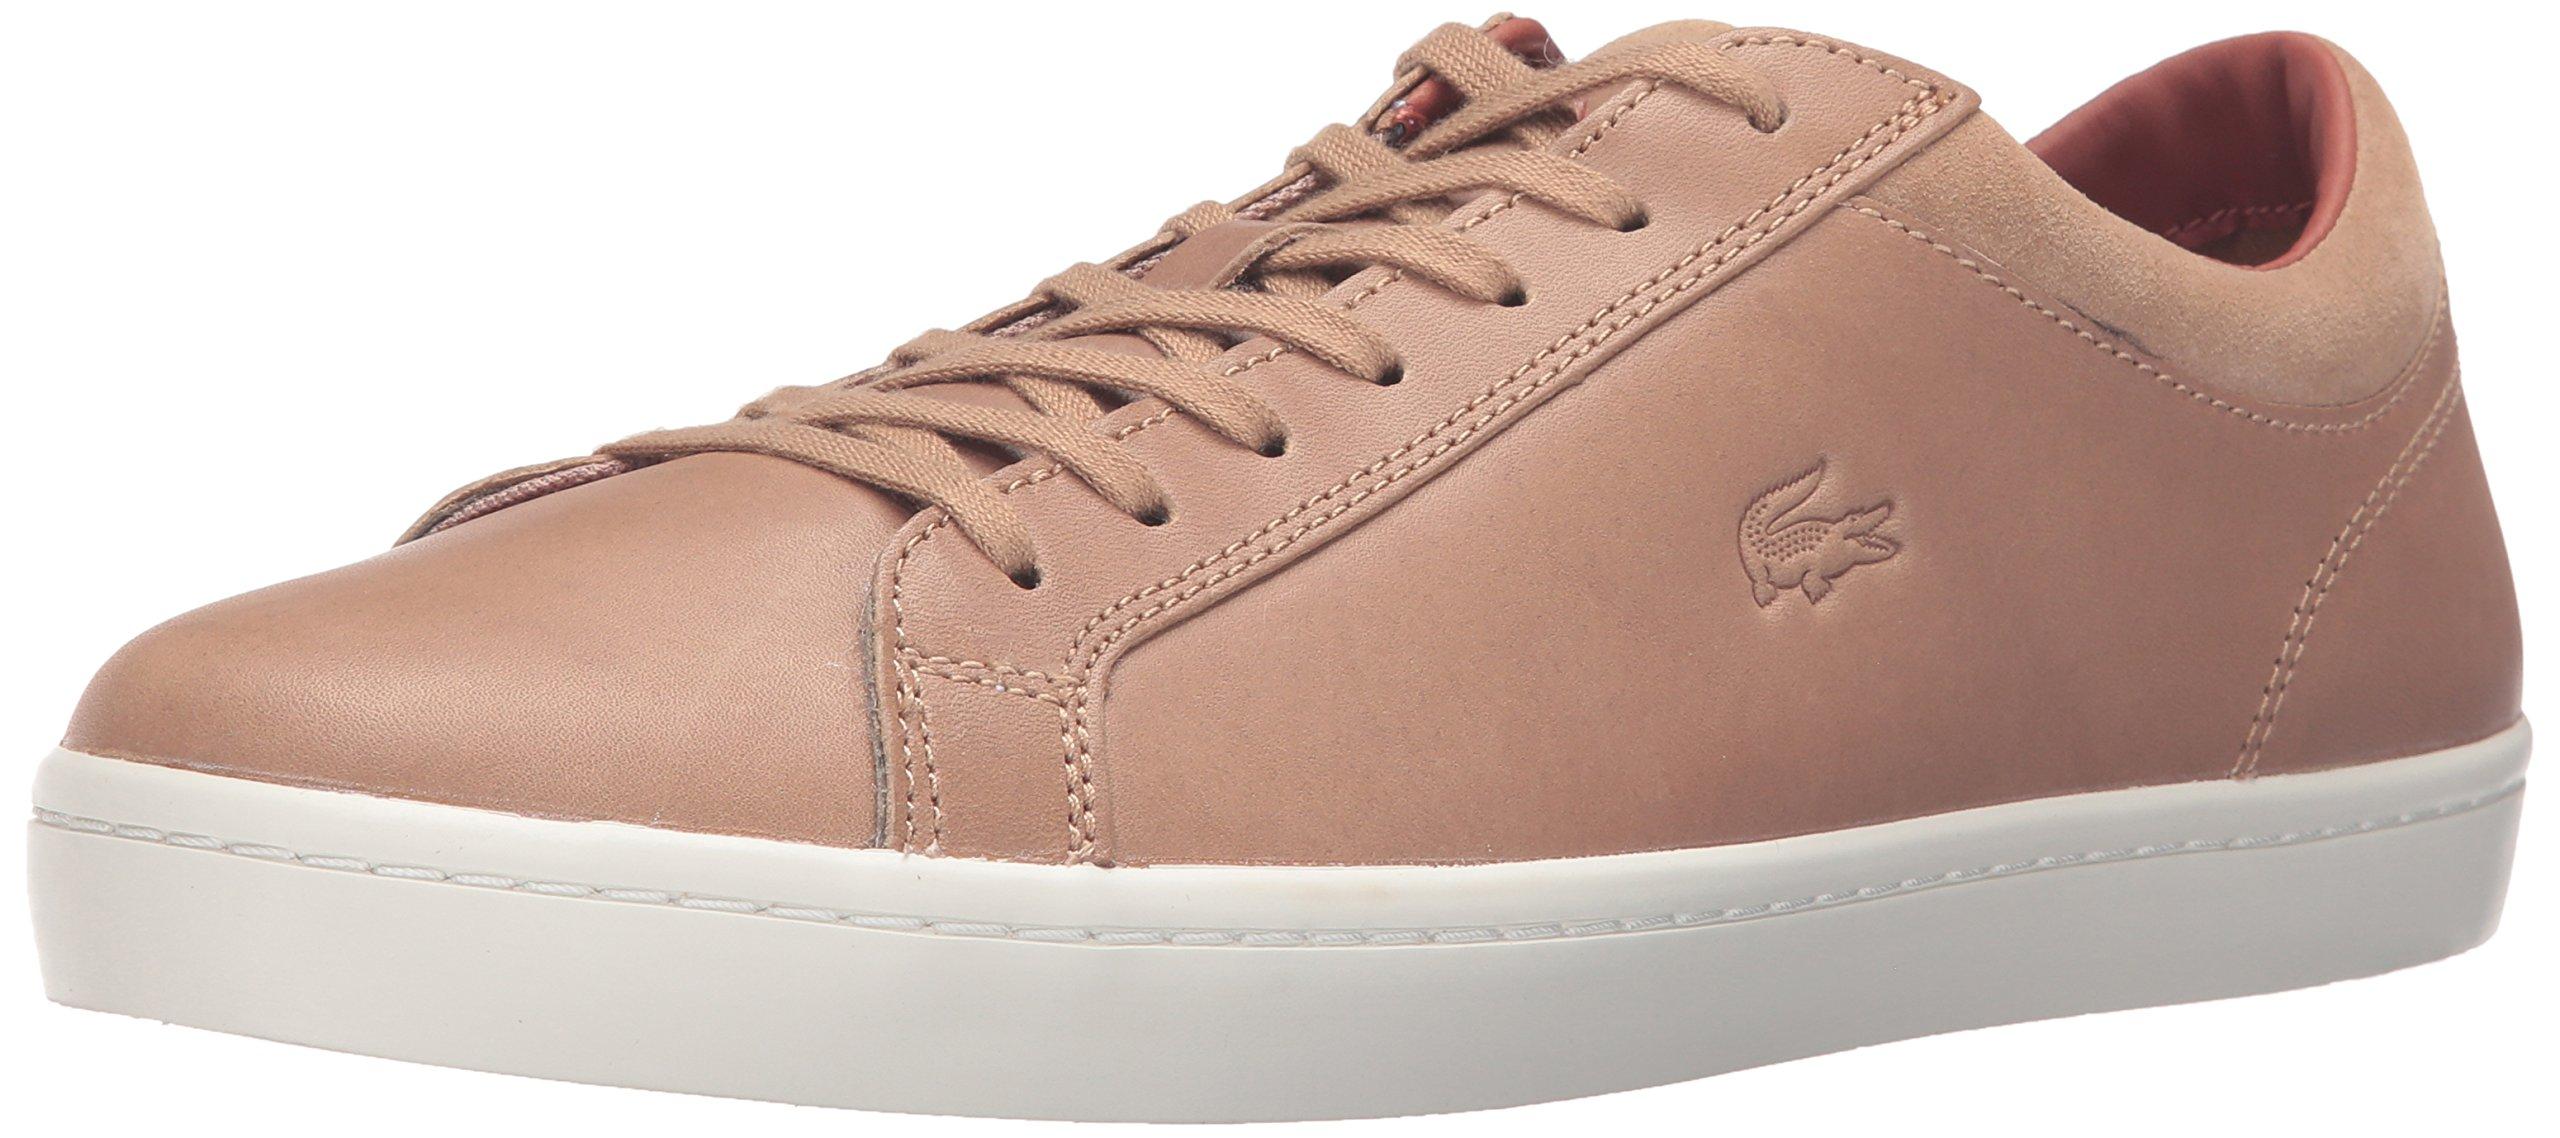 Lacoste Men's Straightset 316 2 Cam Fashion Sneaker, Light Tan, 8.5 M US